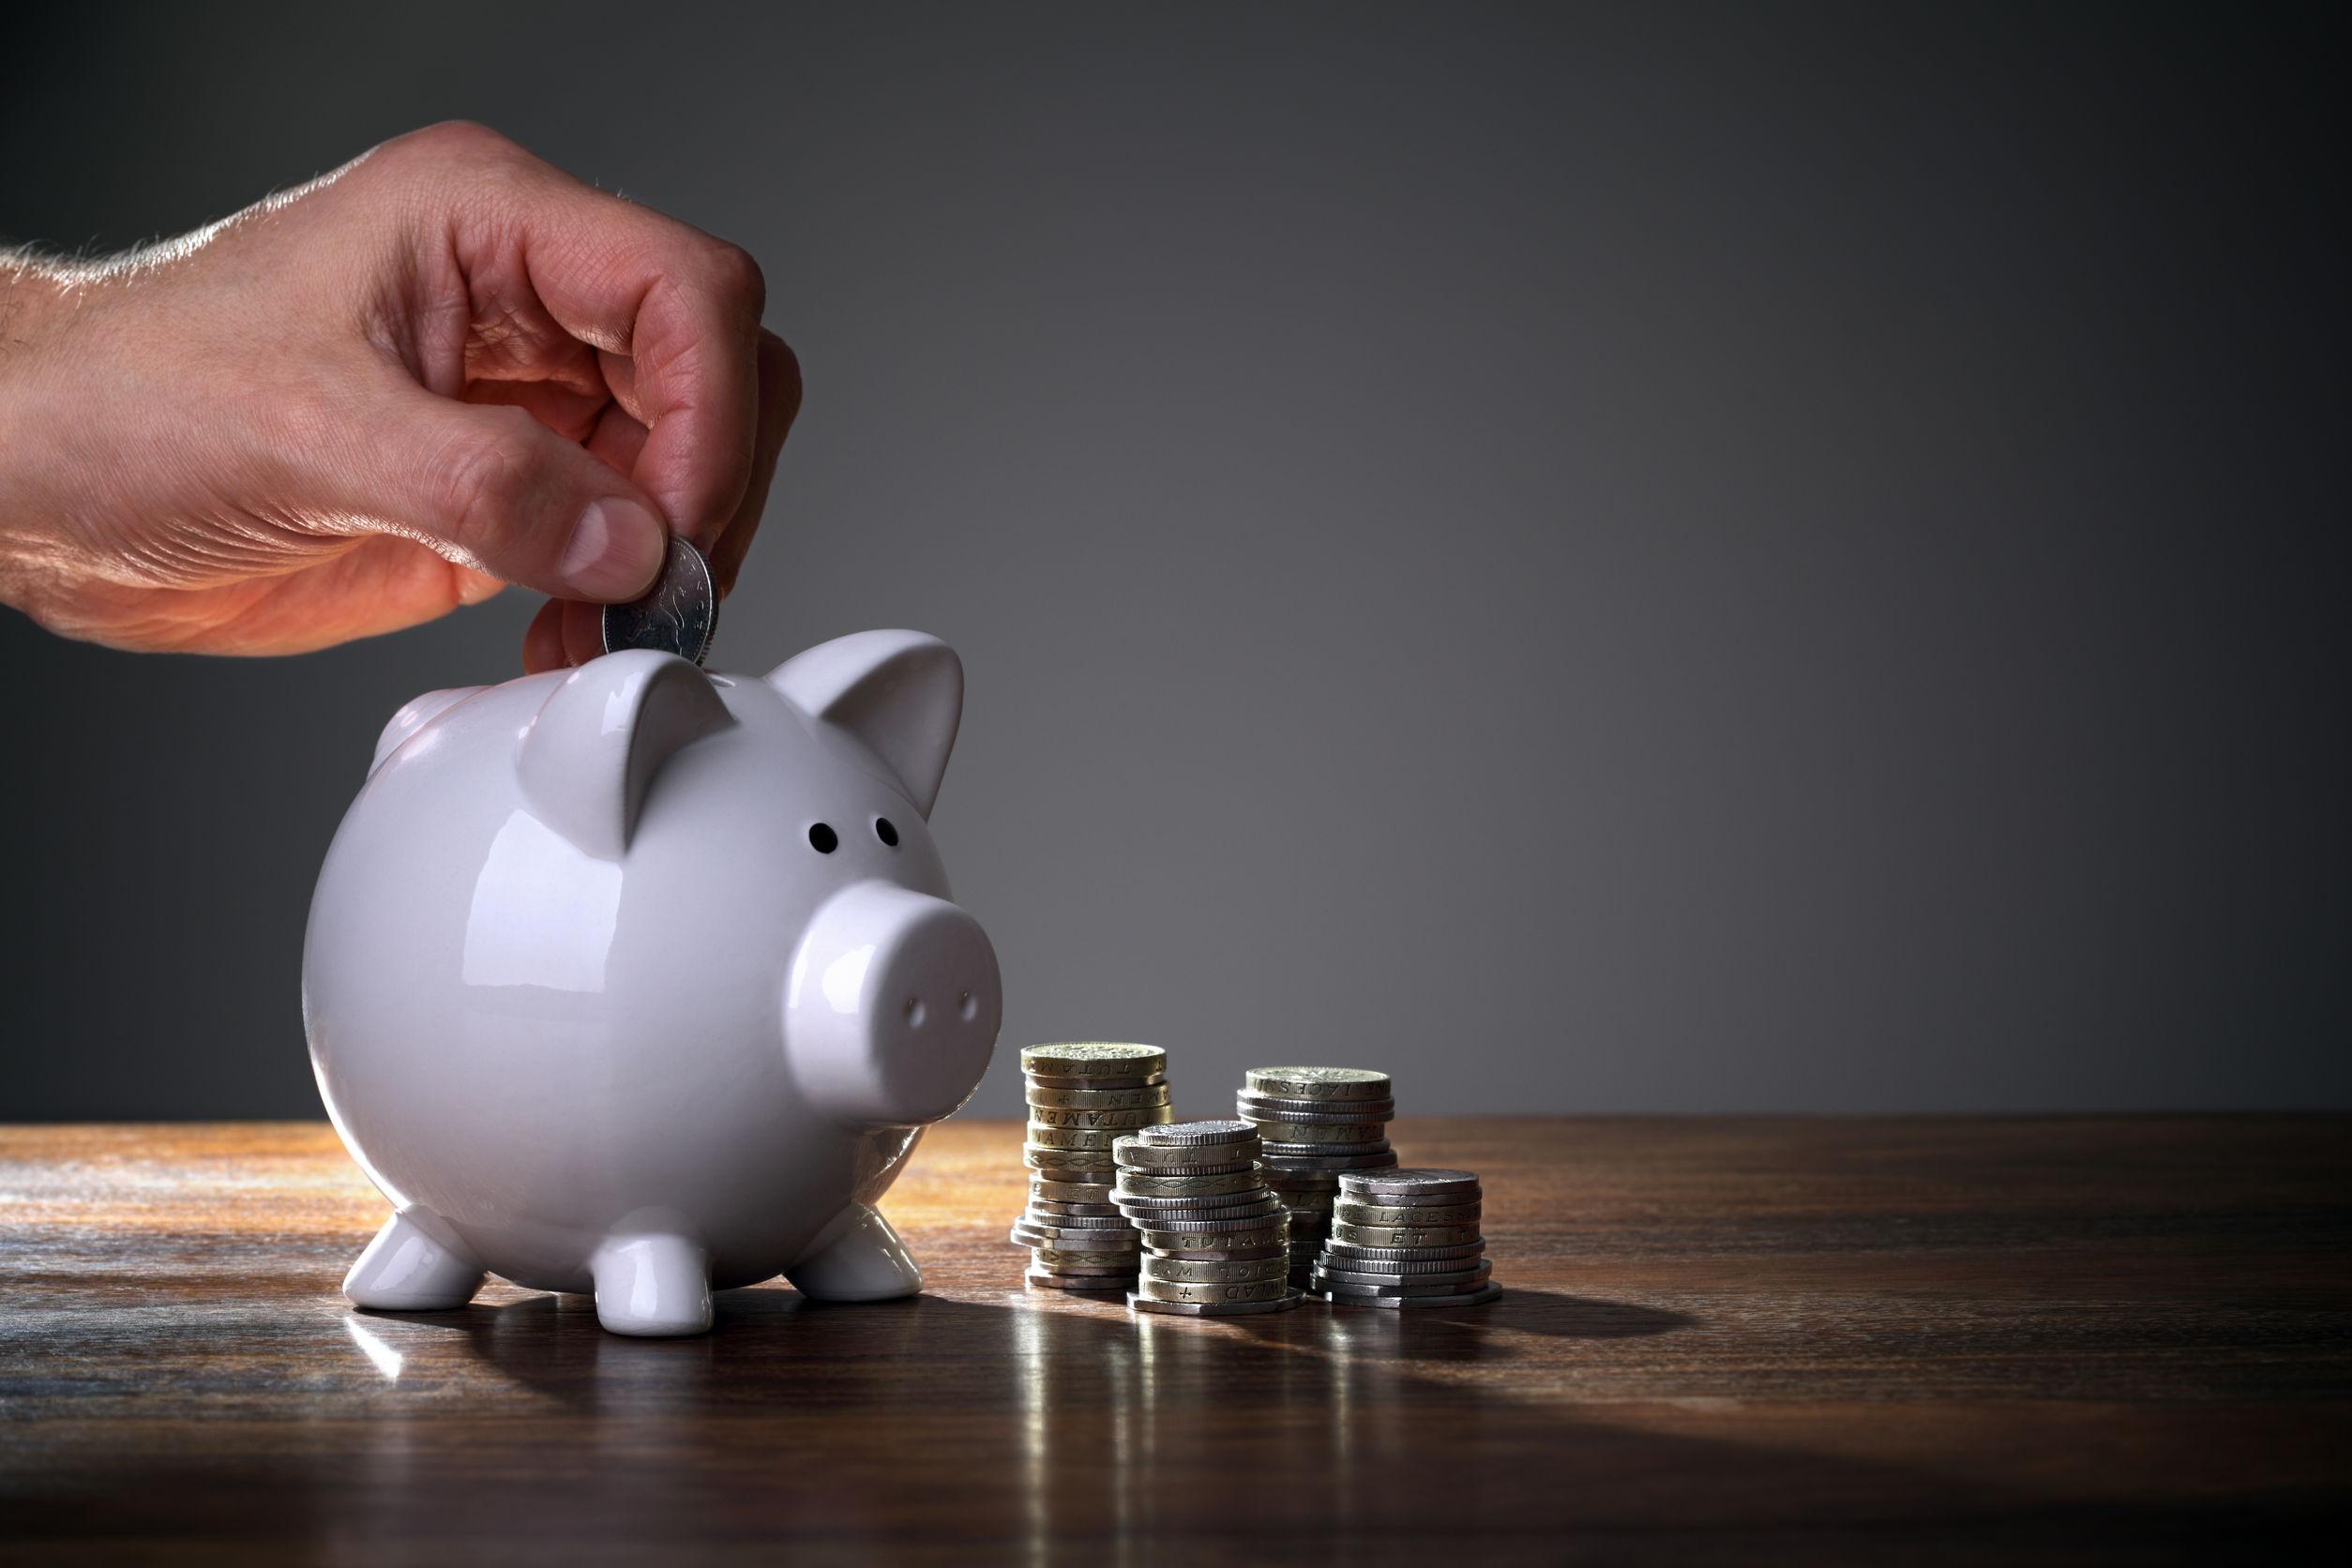 Ile może dorobić emeryt